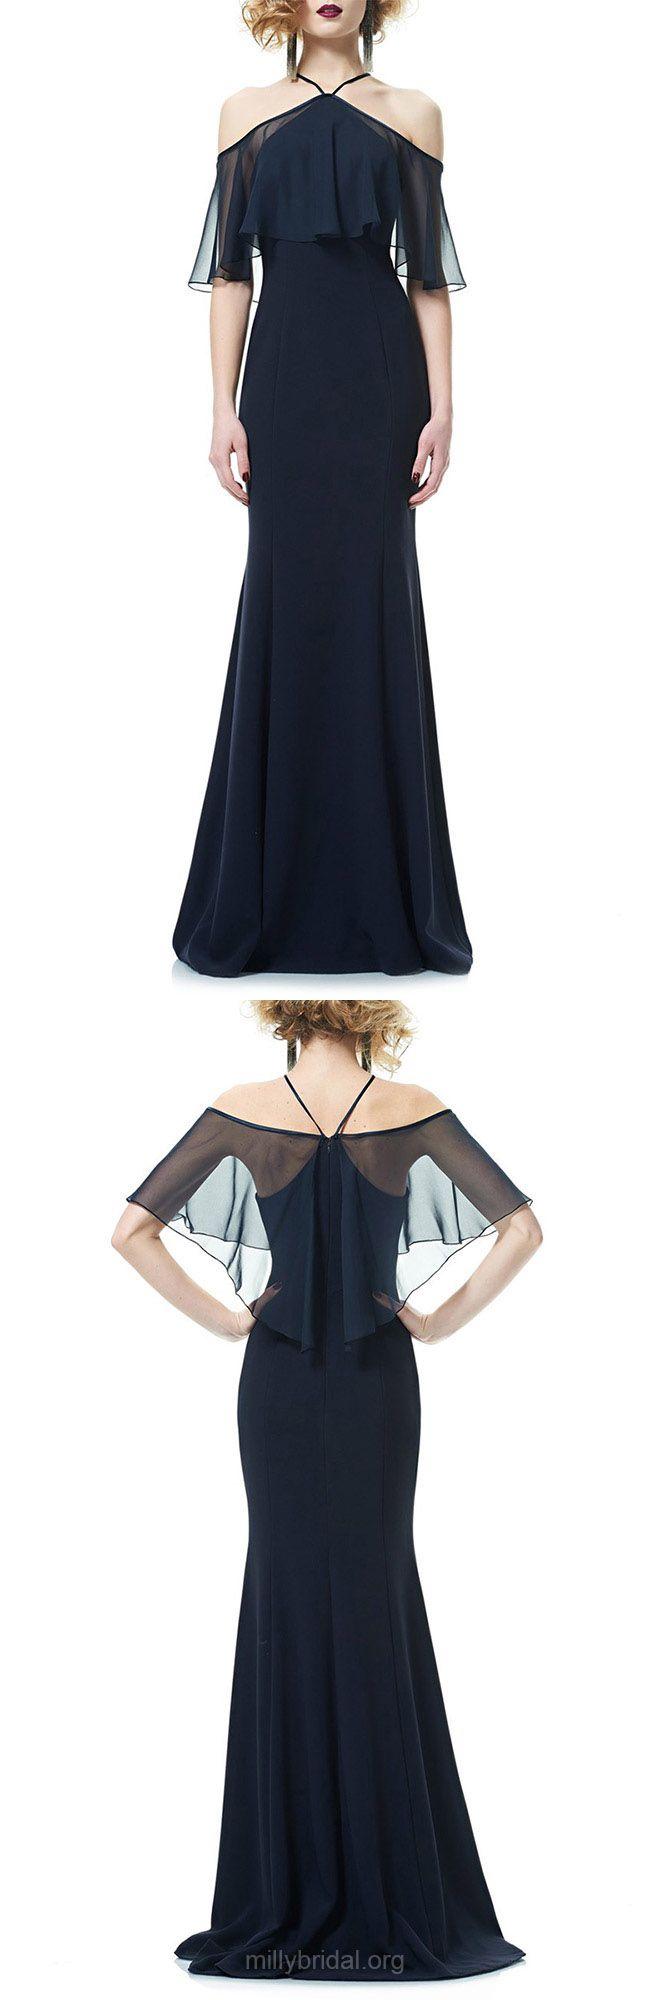 Dark navy prom dresses long cheap formal dresses mermaid